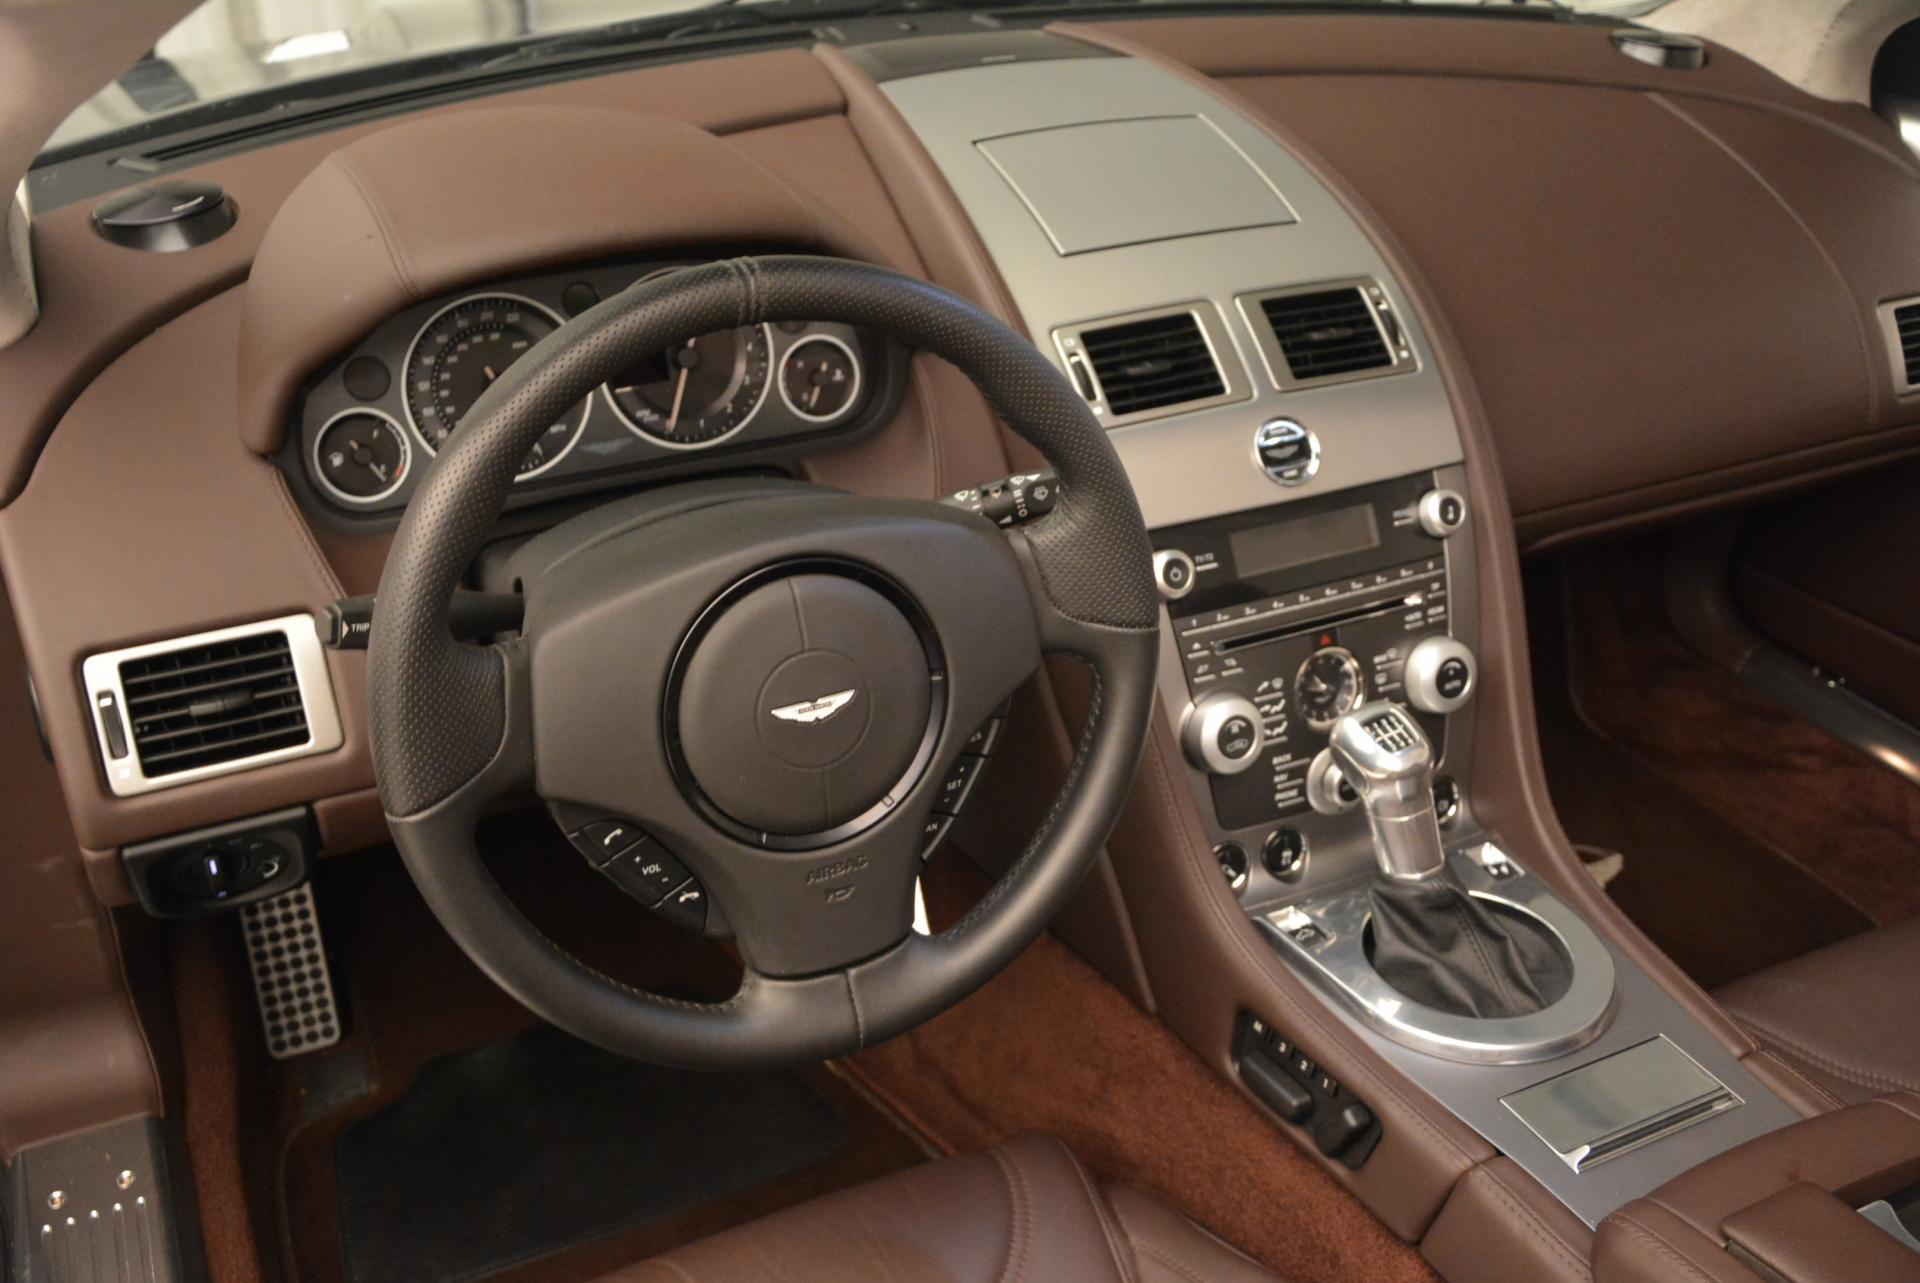 Used 2010 Aston Martin DBS Volante For Sale In Greenwich, CT 87_p25